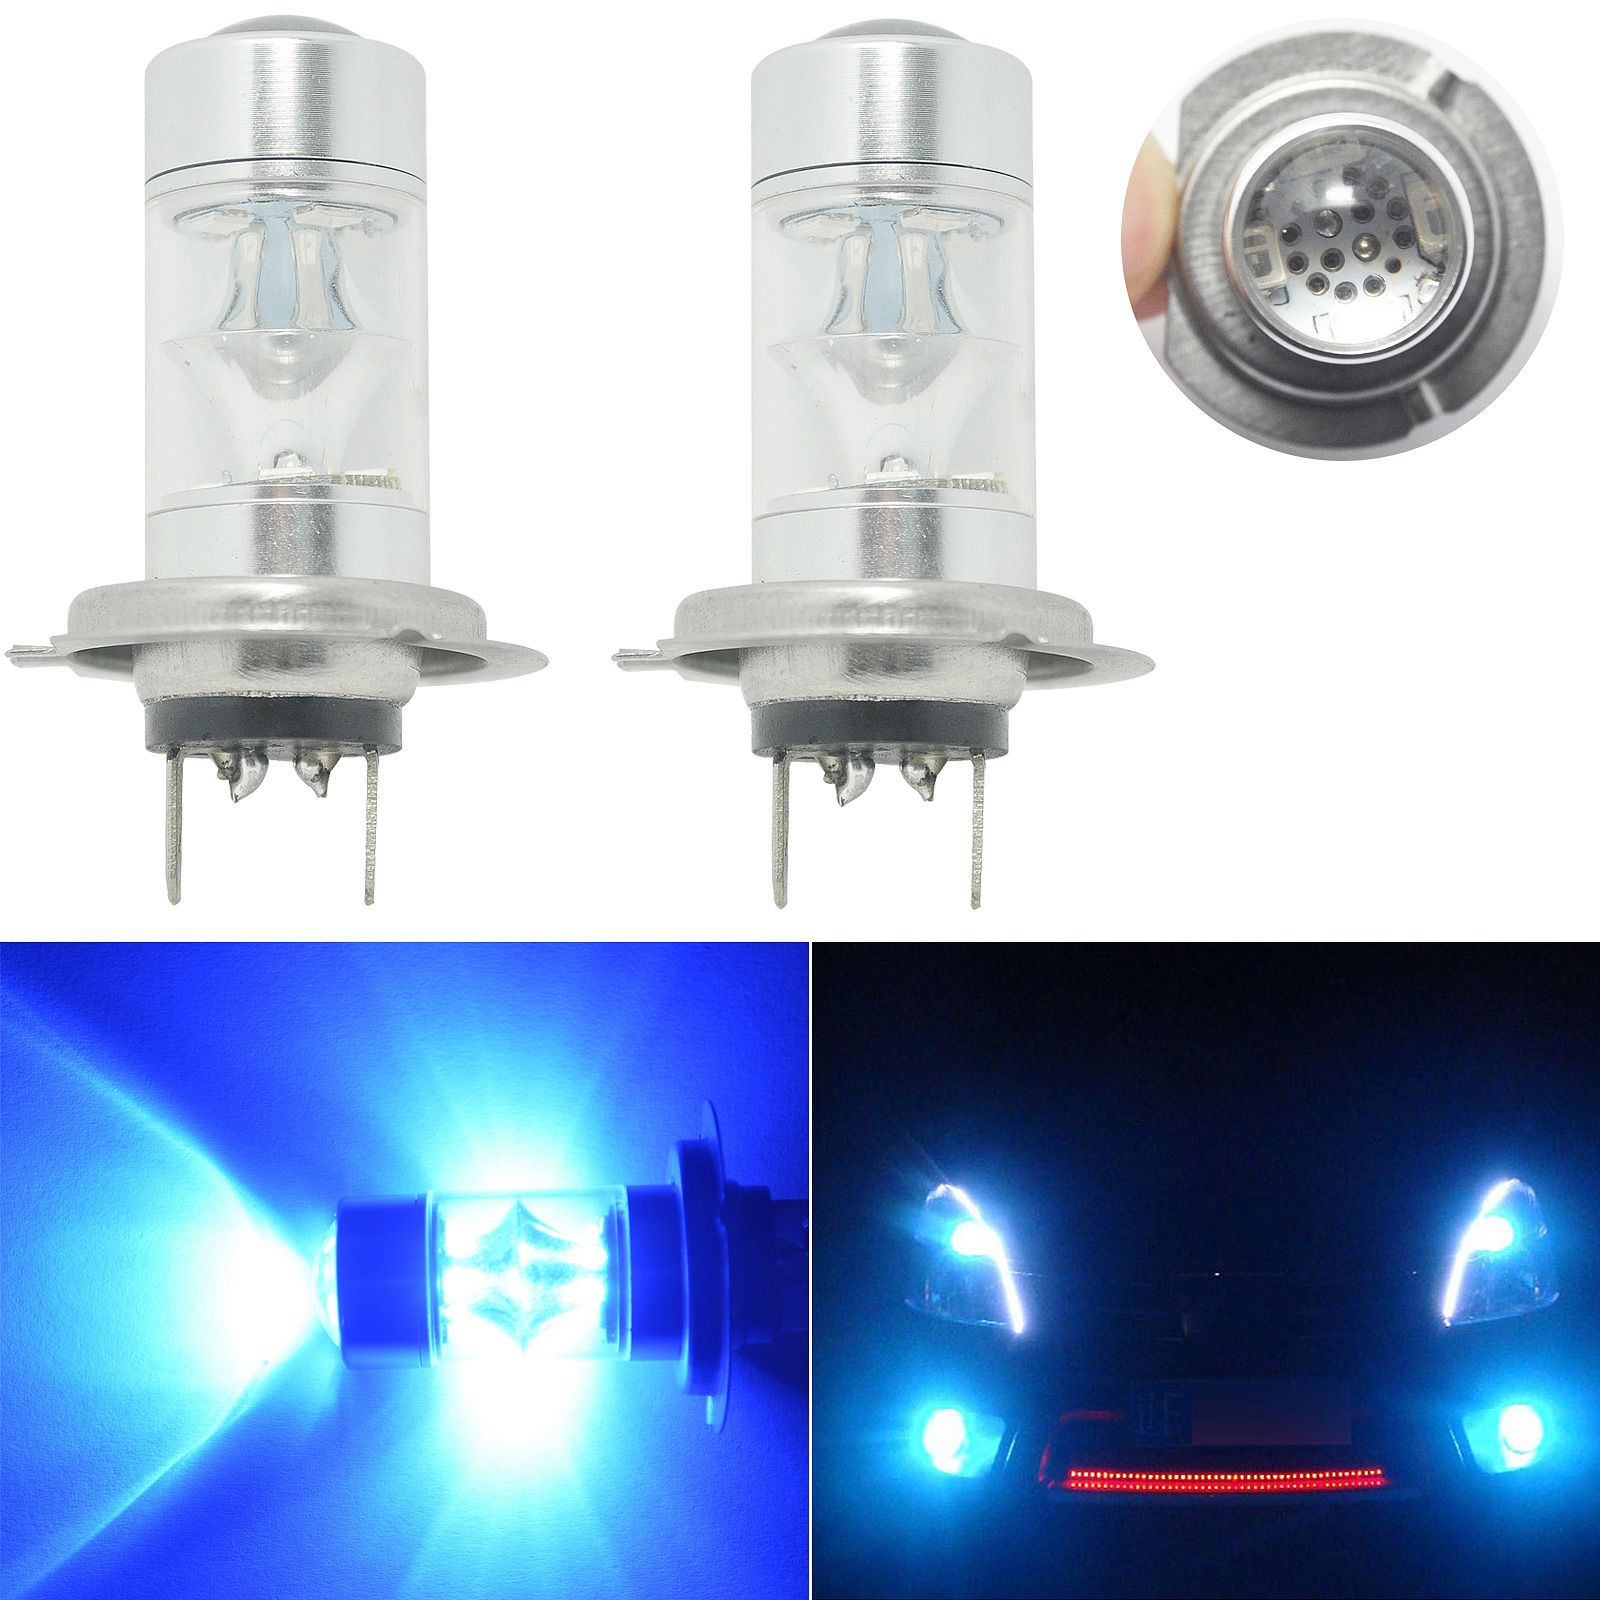 2pcs Car H7 Car Led Fog Light 2323 60w Driving Projector Drl 10000k Ultra Blue Bulbs Led Fog Lights